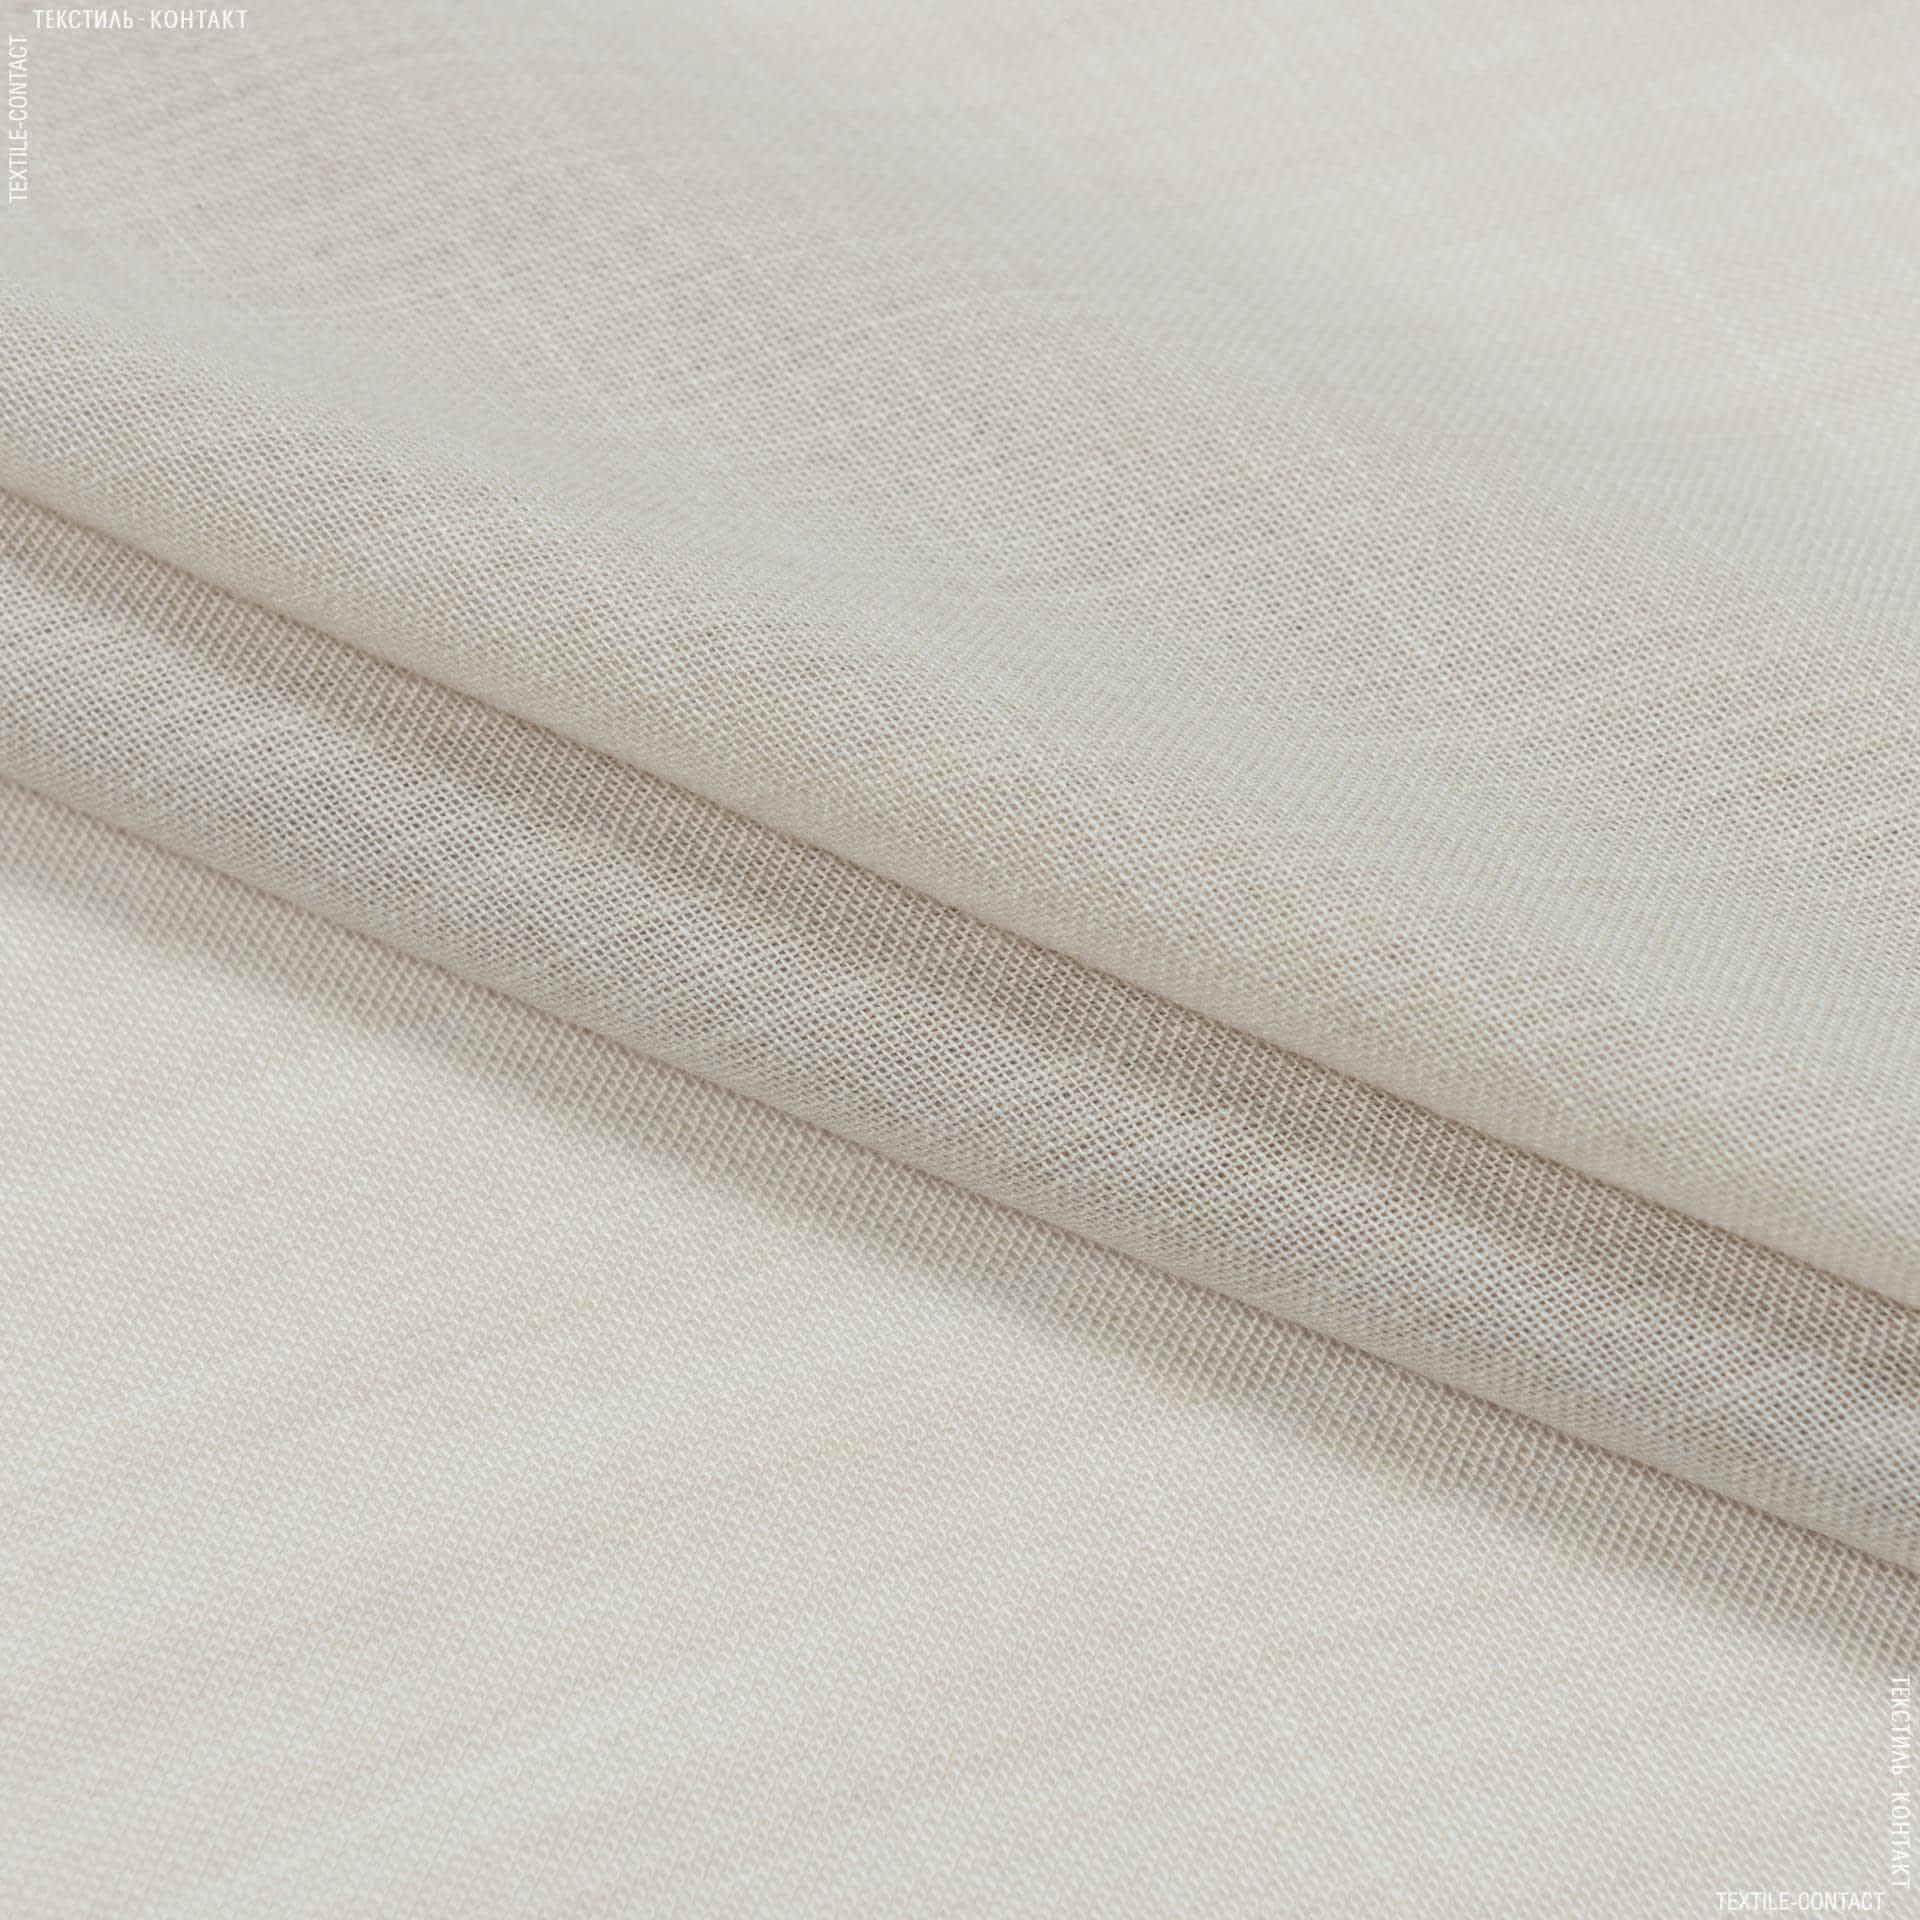 Ткани для тюли - Тюль с утяжелителем виктория /victoria беж